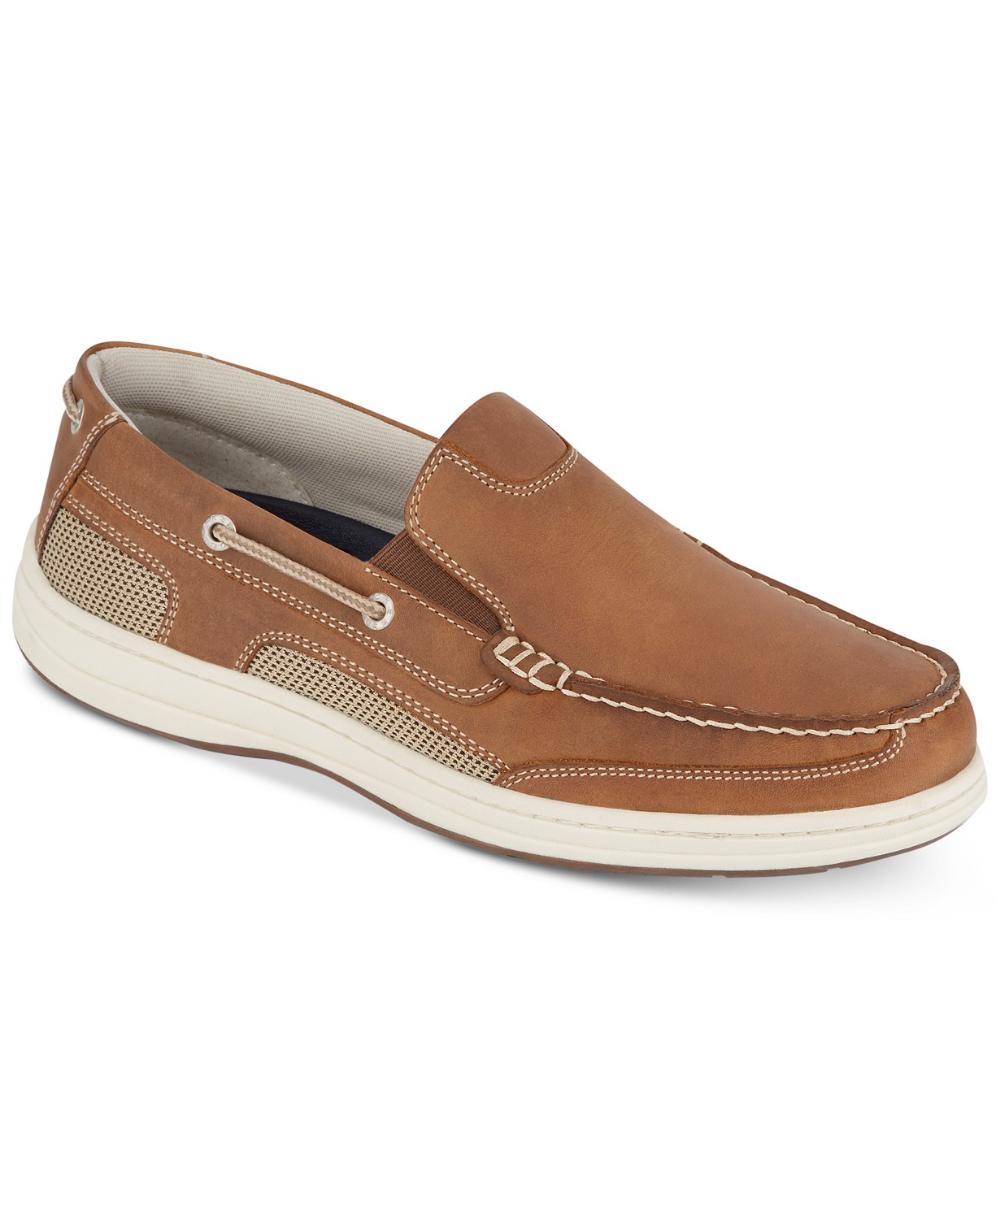 Dockers Men's Tiller Boat Shoes & Reviews All Men's